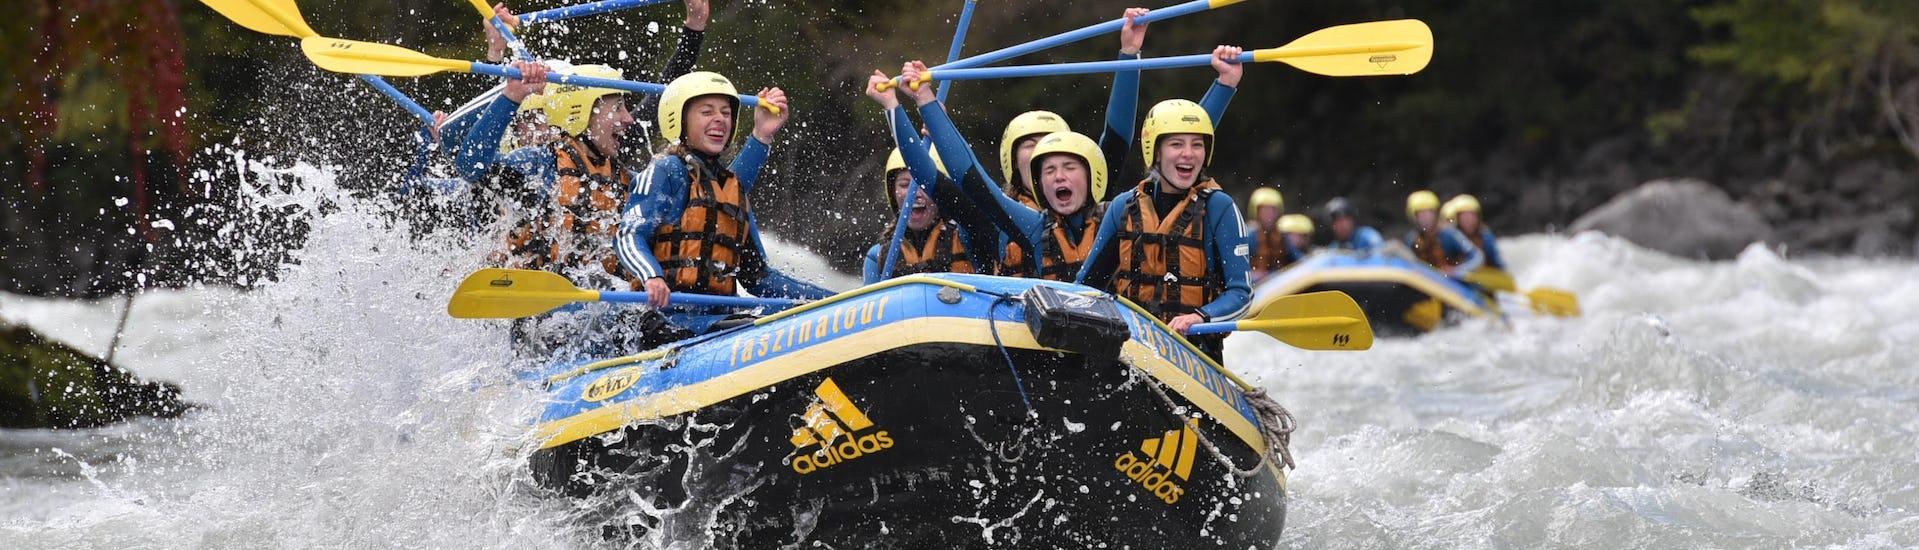 rafting-for-adrenaline-junkies---imster--otz-faszinatour-hero